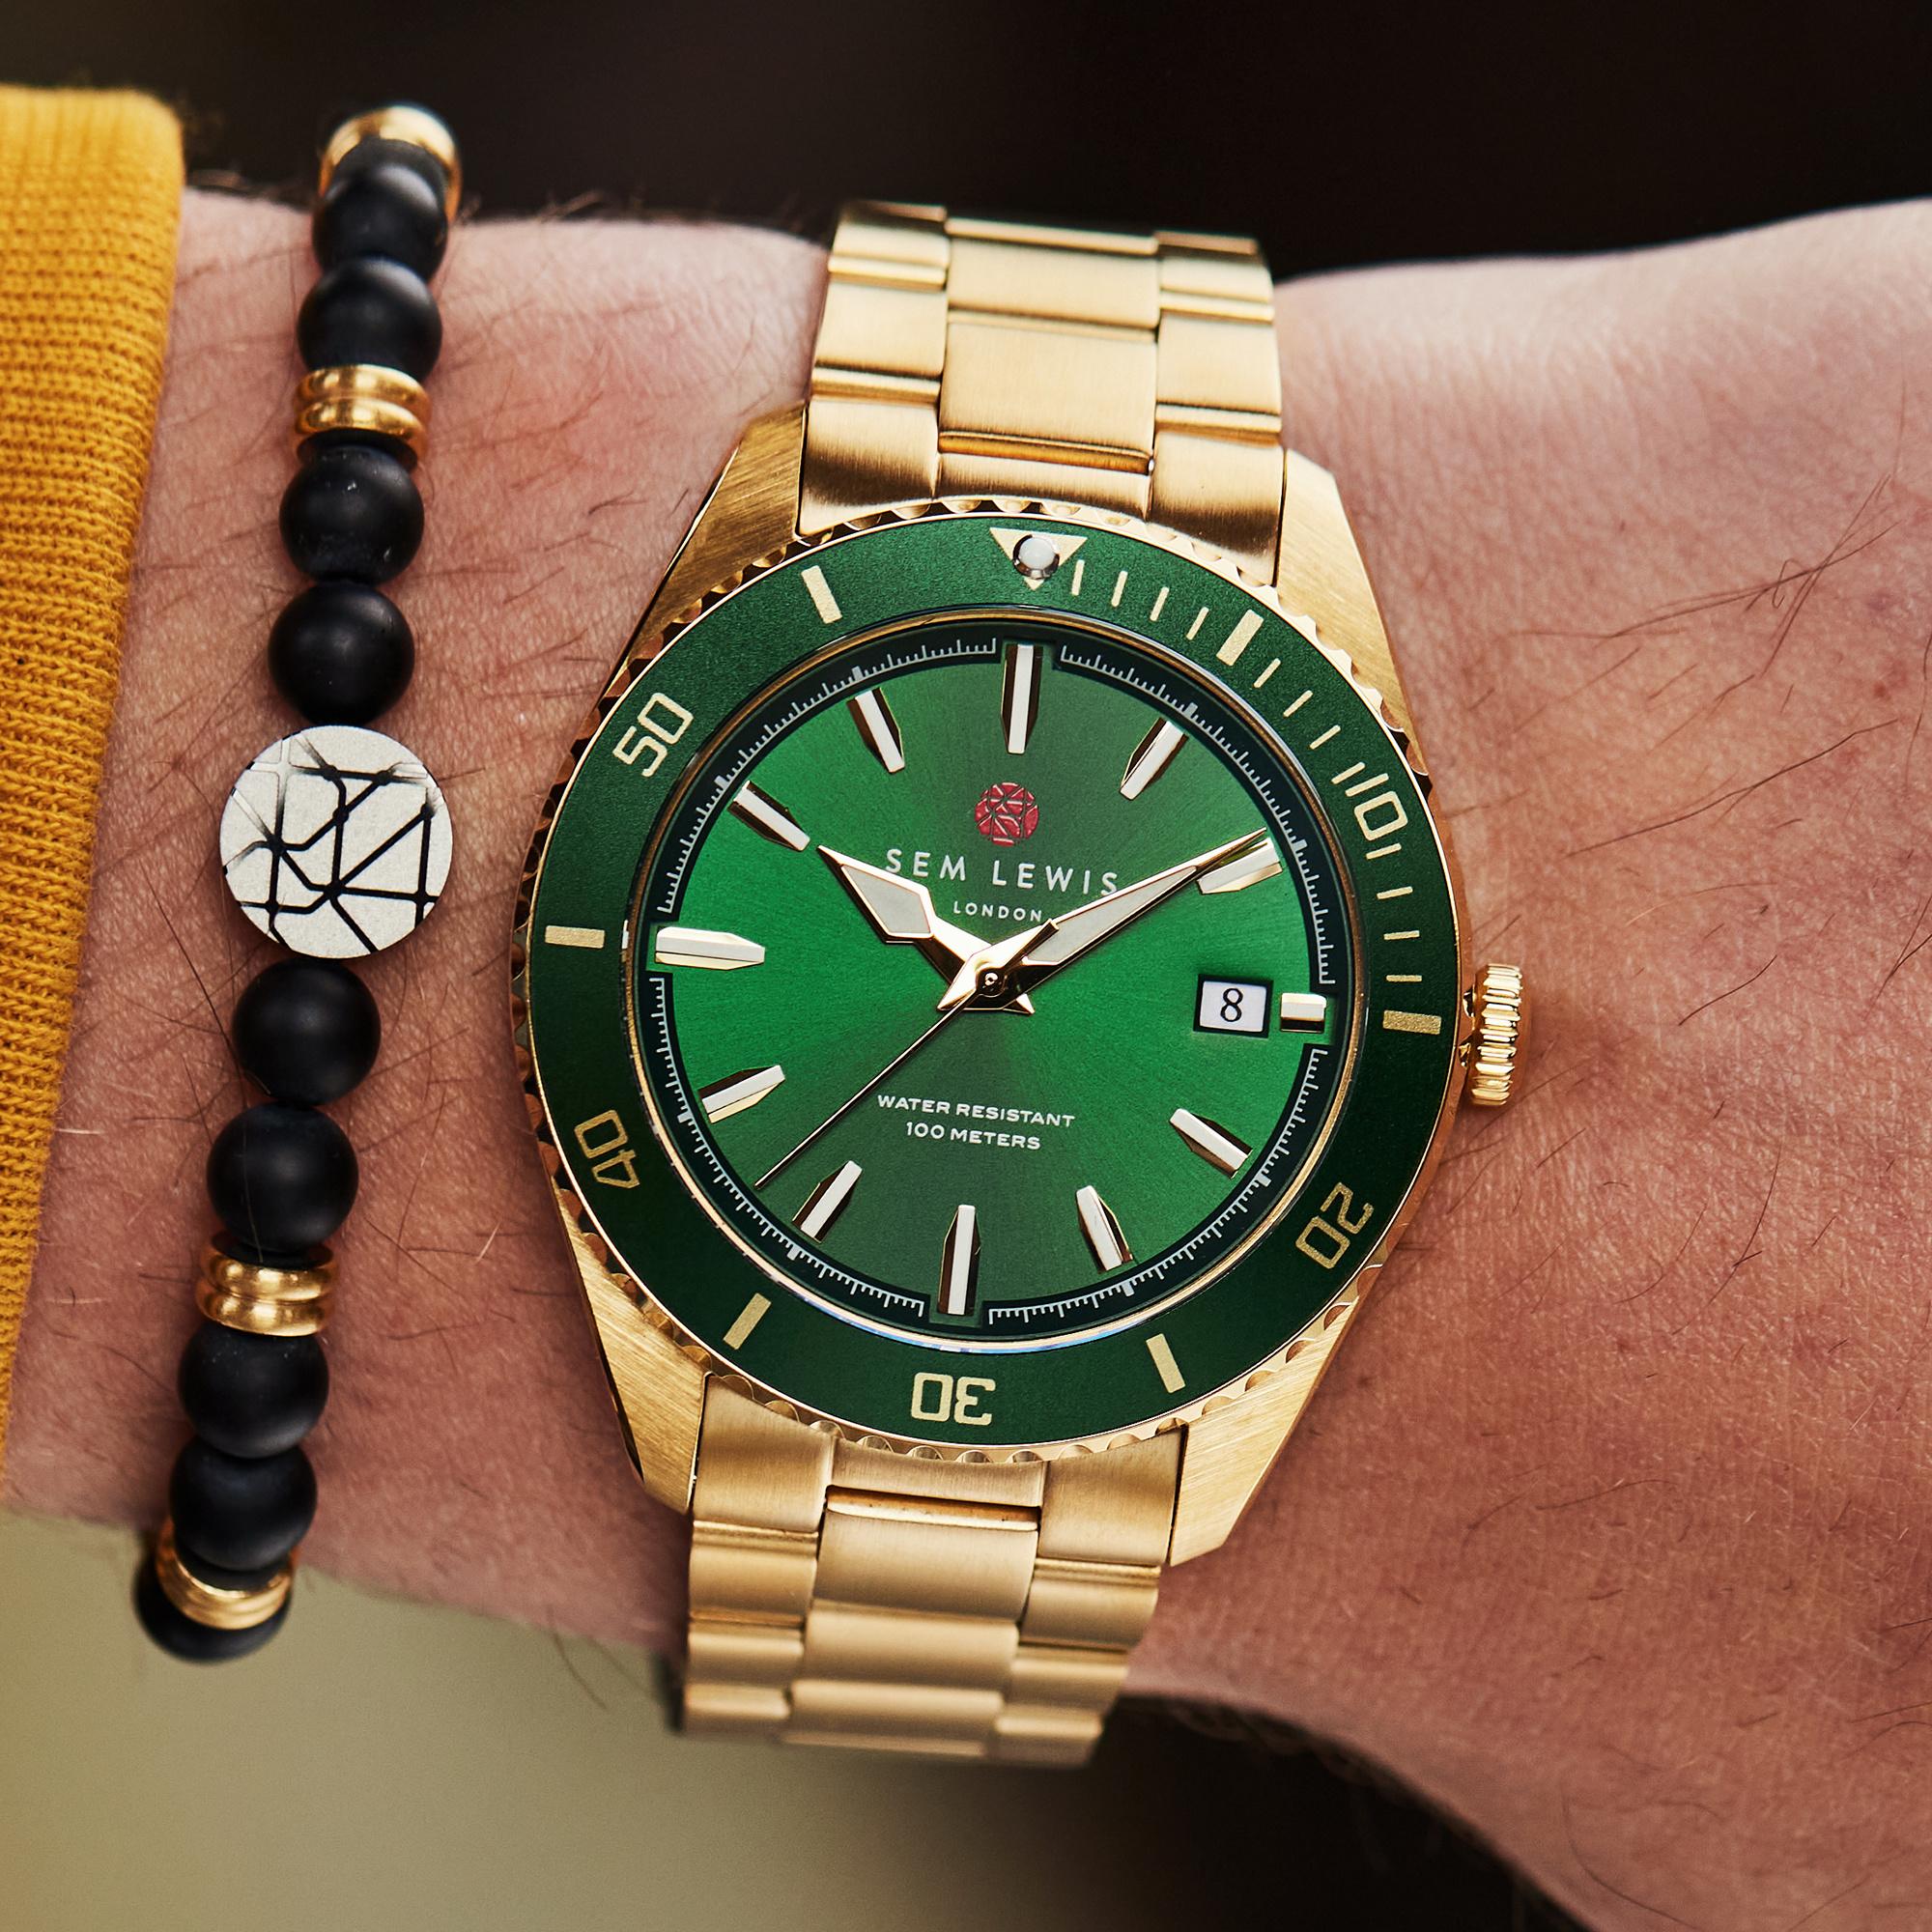 Sem Lewis Lundy Island Diver klocka guldfärgad och grön